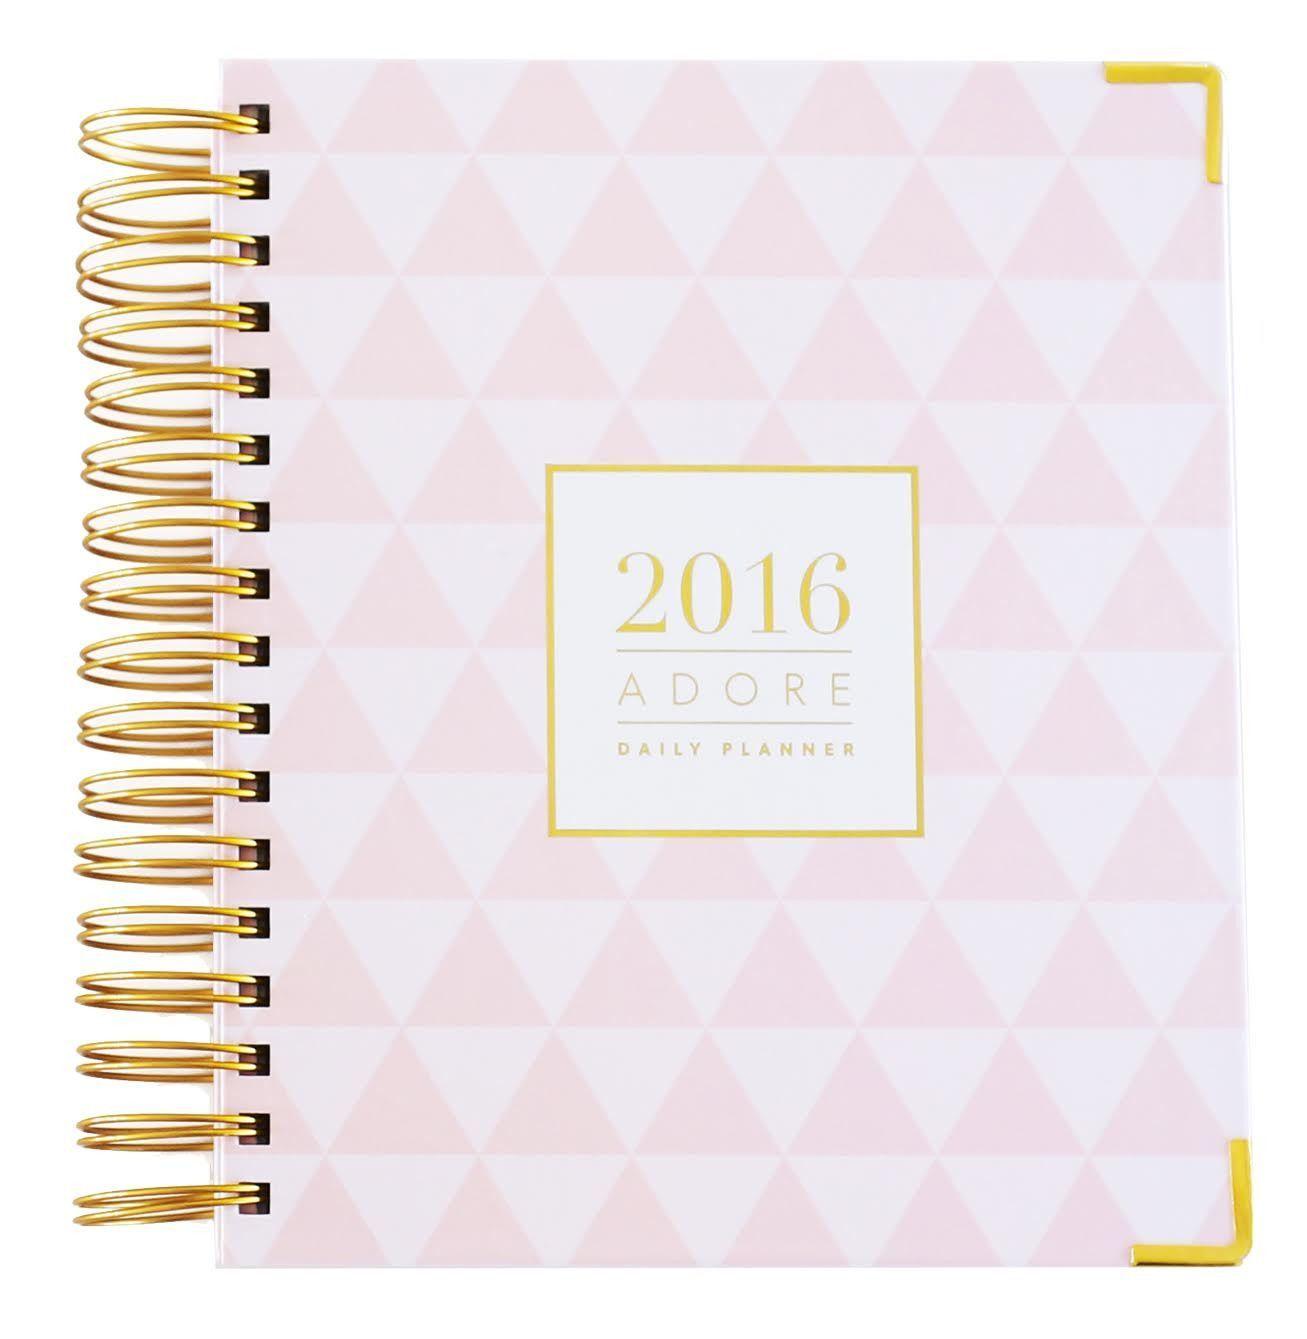 Adore Magazine 2016 Daily Planner in Pink | cuadernos | Pinterest